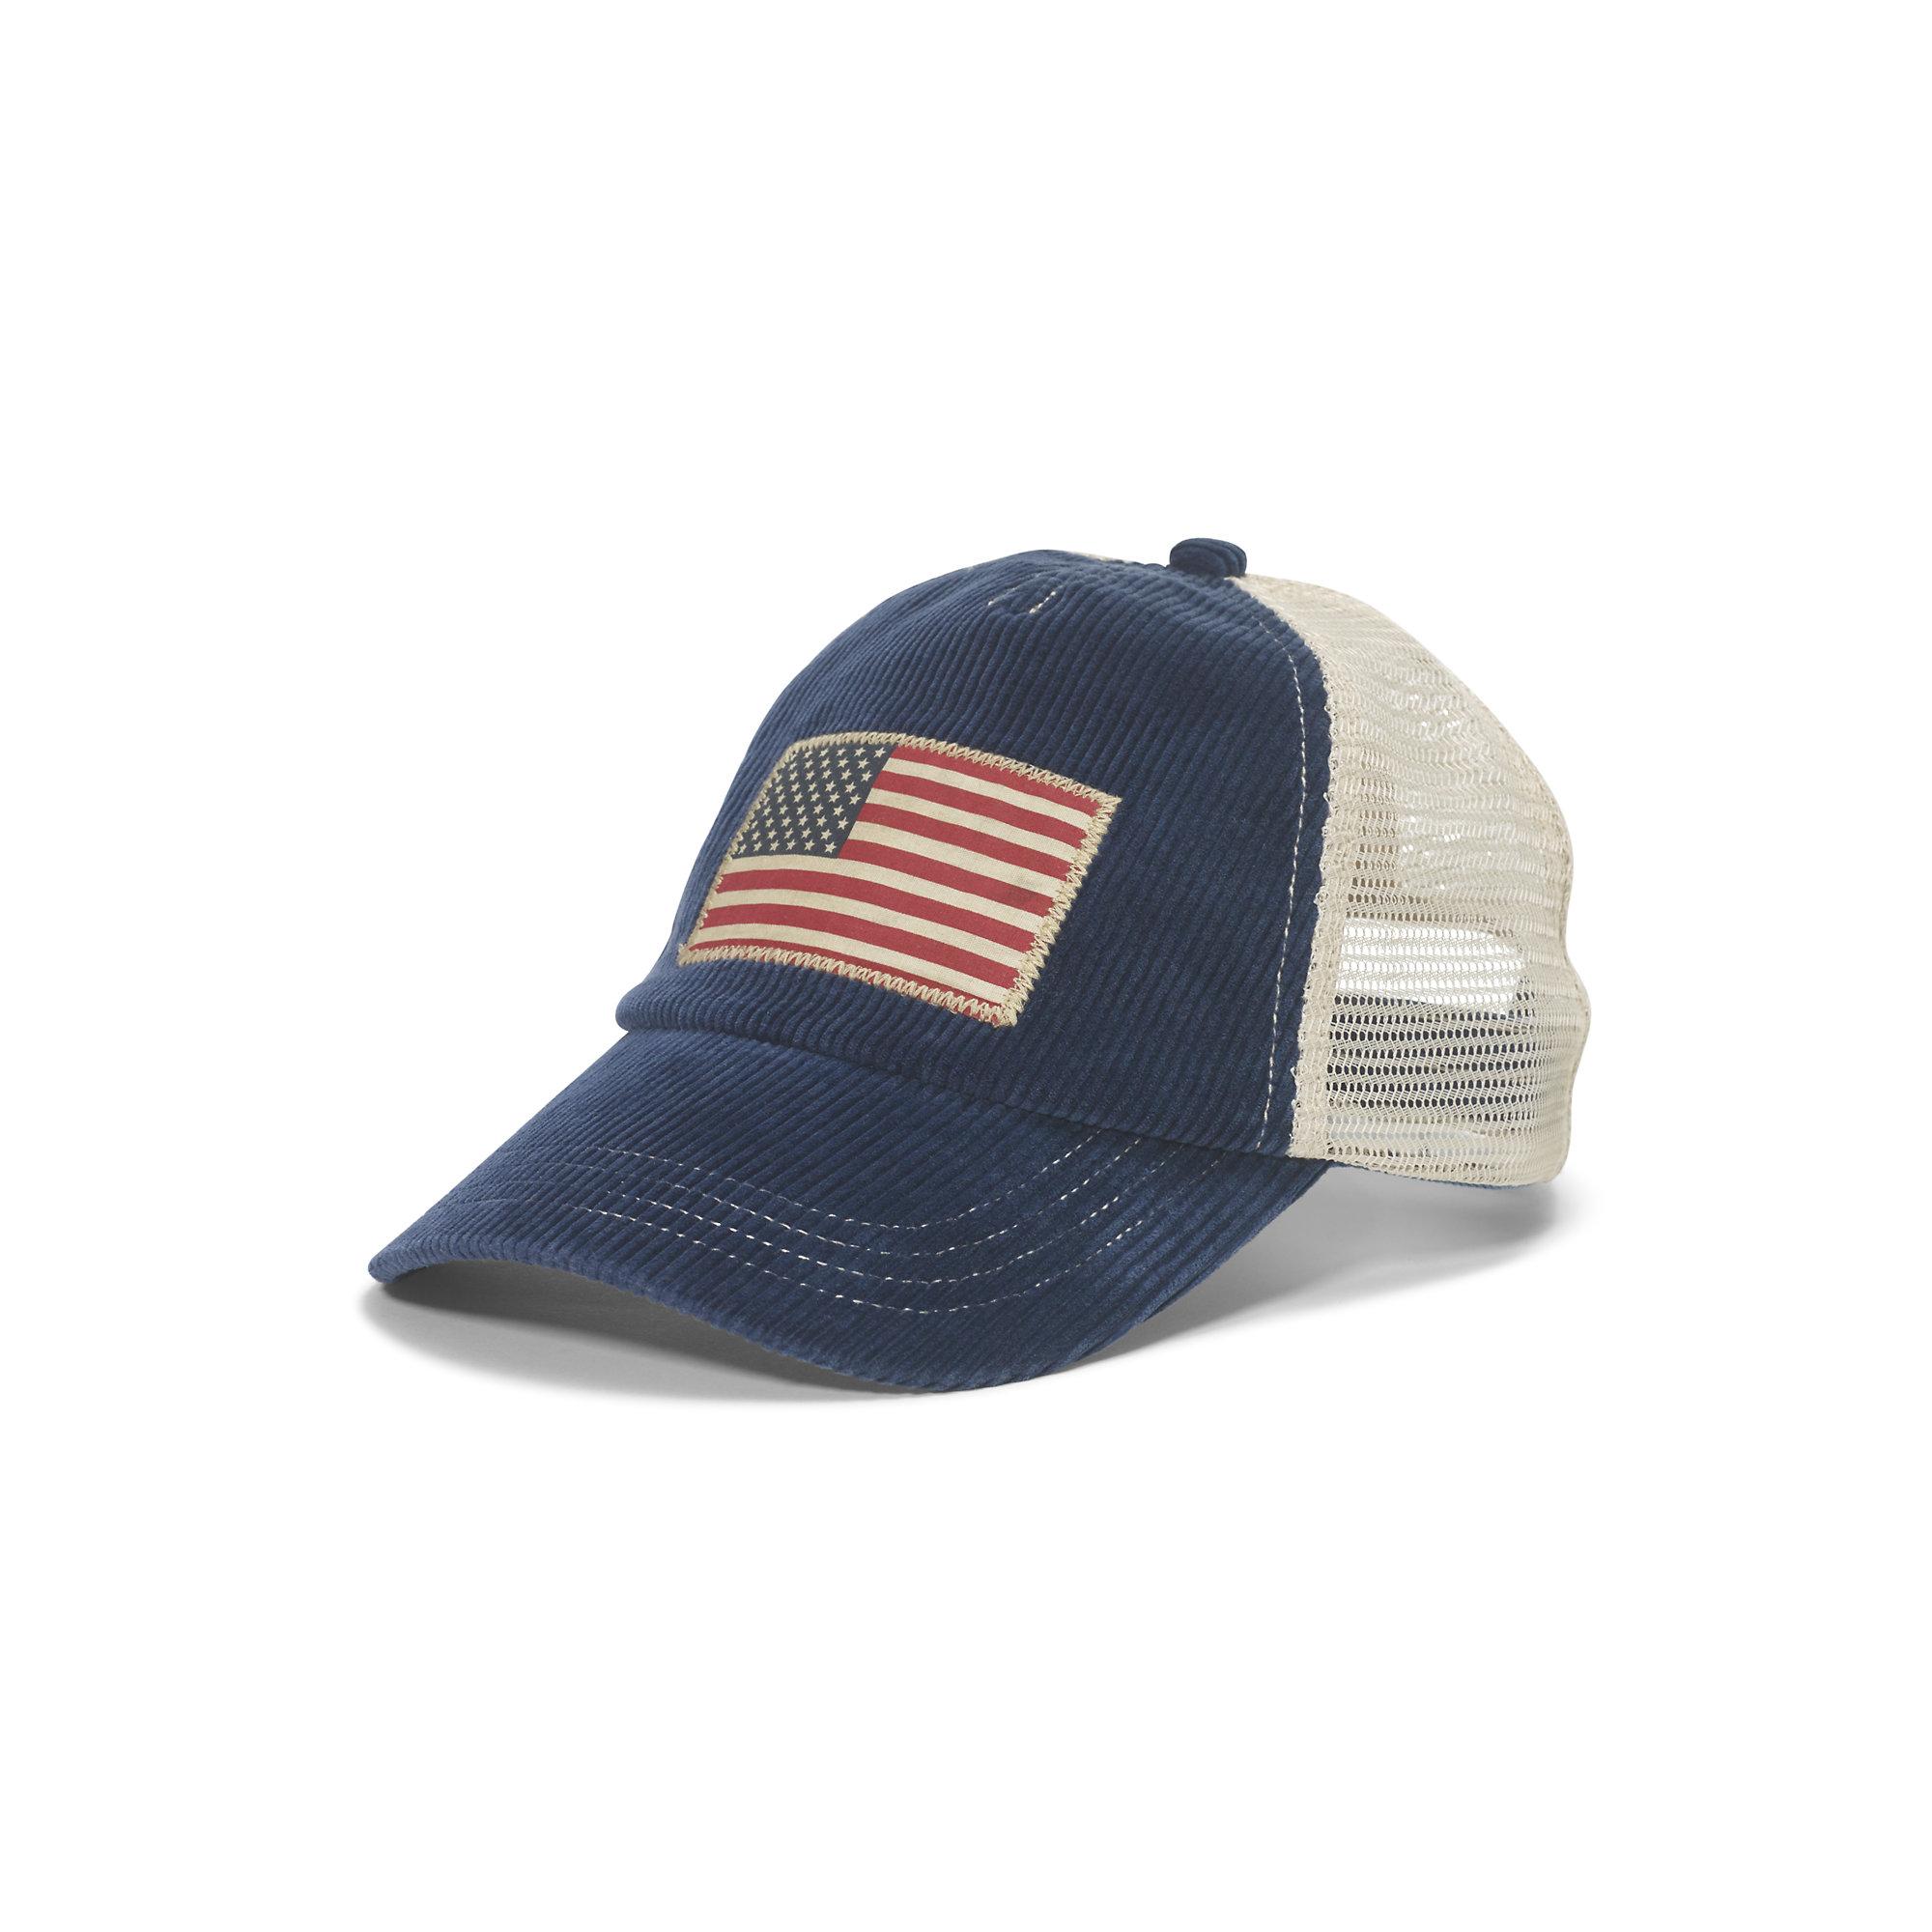 Lyst - Polo Ralph Lauren Corduroy Flag Trucker Cap in Blue for Men 65d6260ce25